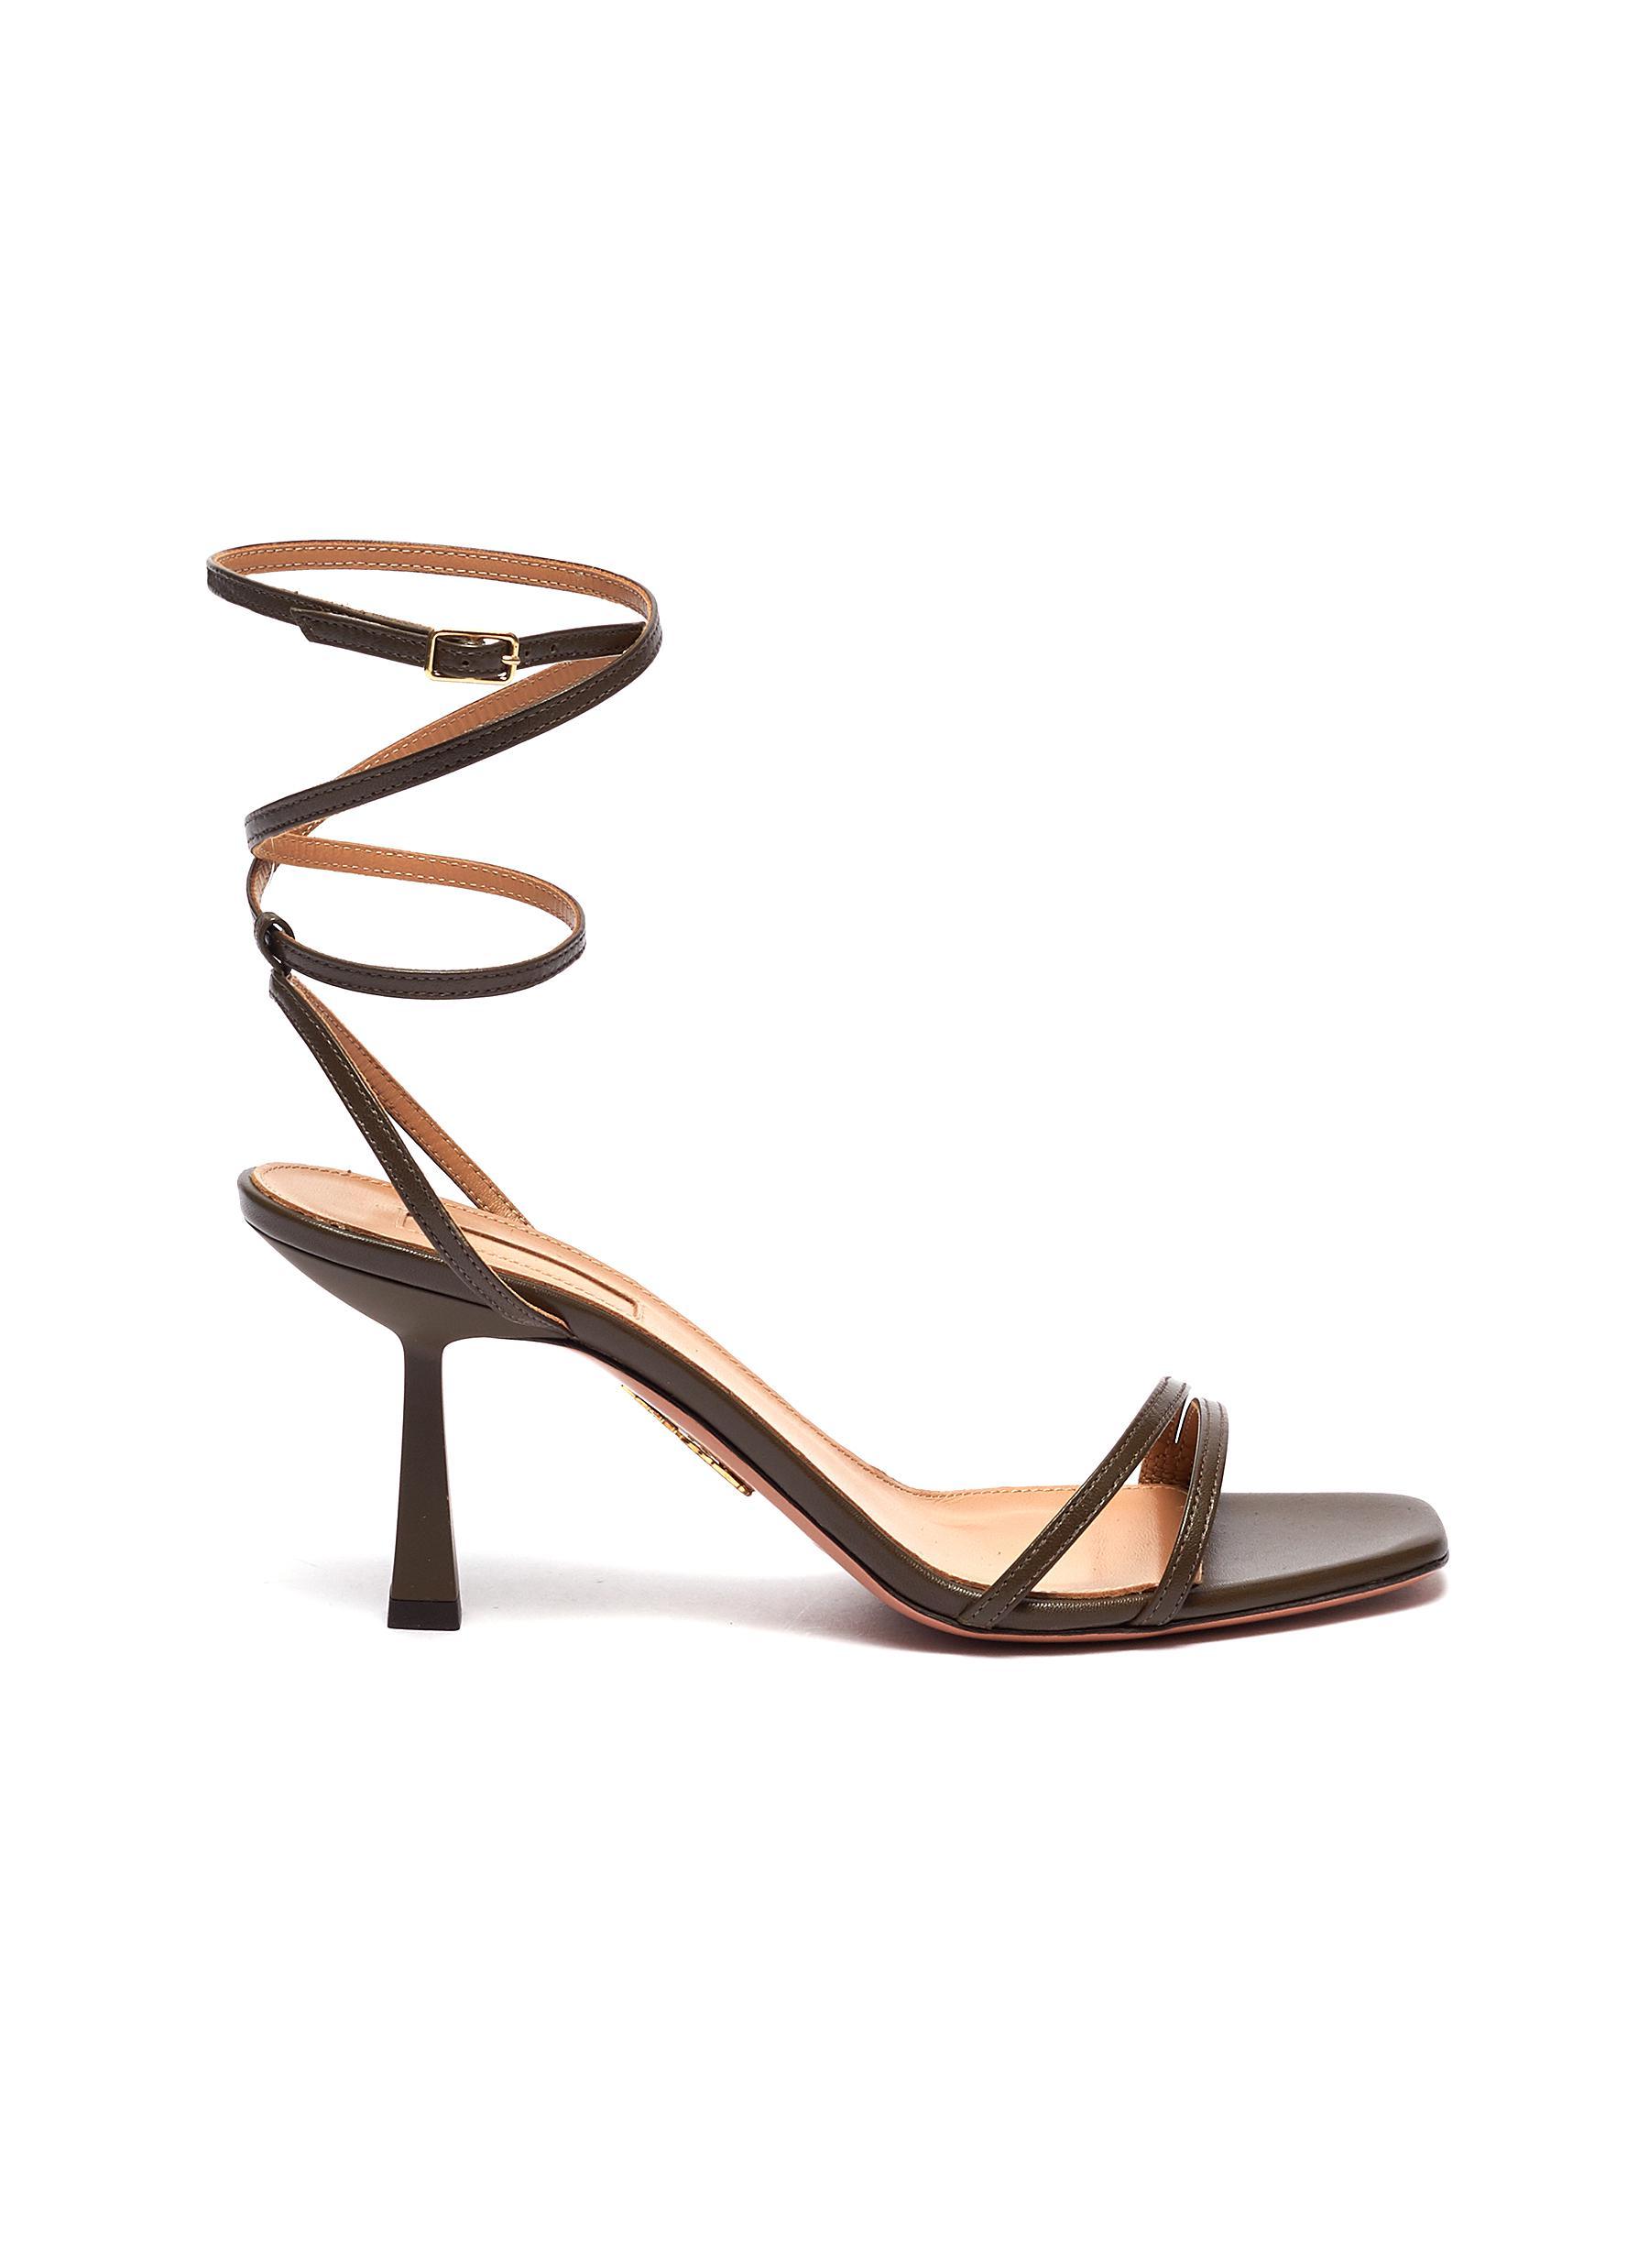 Aquazzura Mid Heels Isabel Ankle Strap Leather Sandals